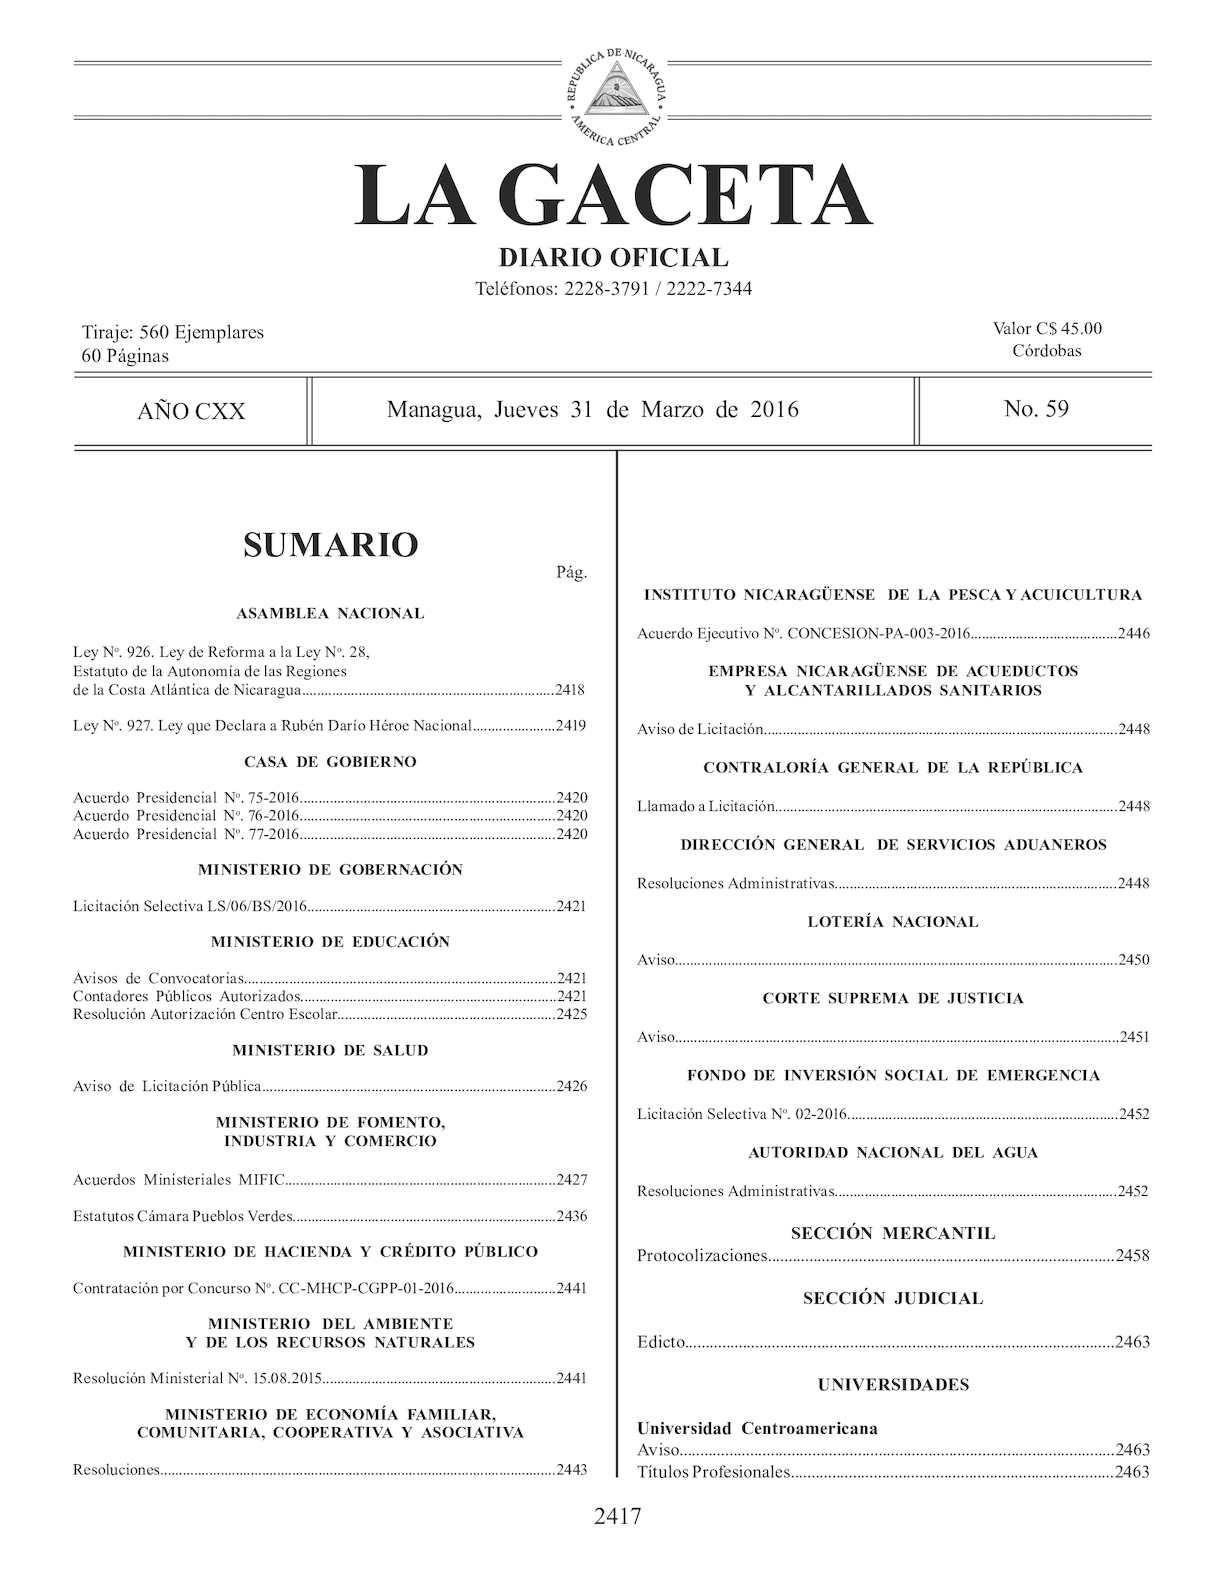 Gaceta No 59 Jueves 31 De Marzo De 2016